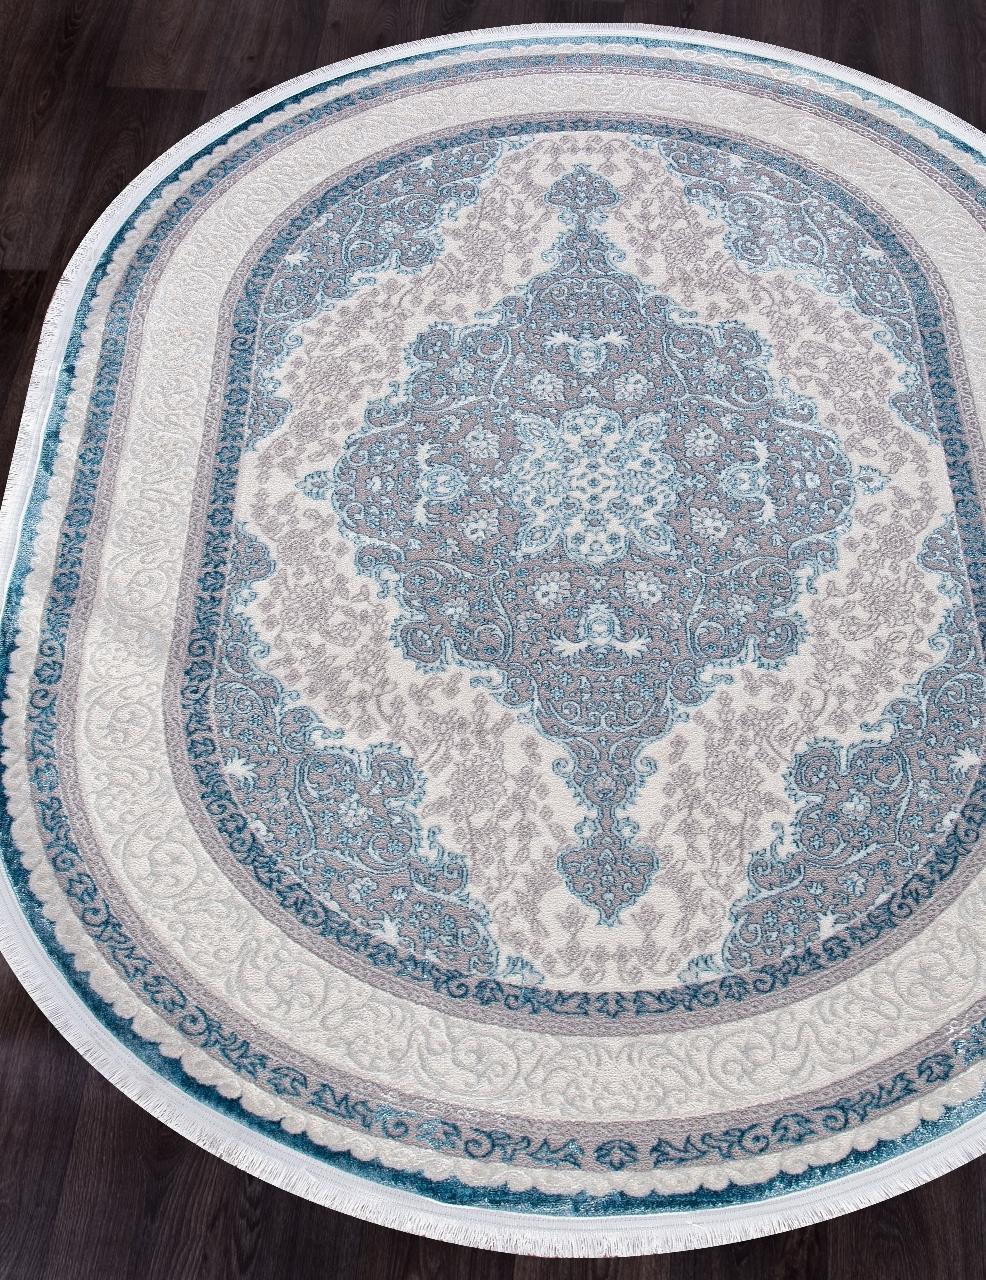 Ковер 0T249RG - BLUE / BLUE - Овал - коллекция ALFANI